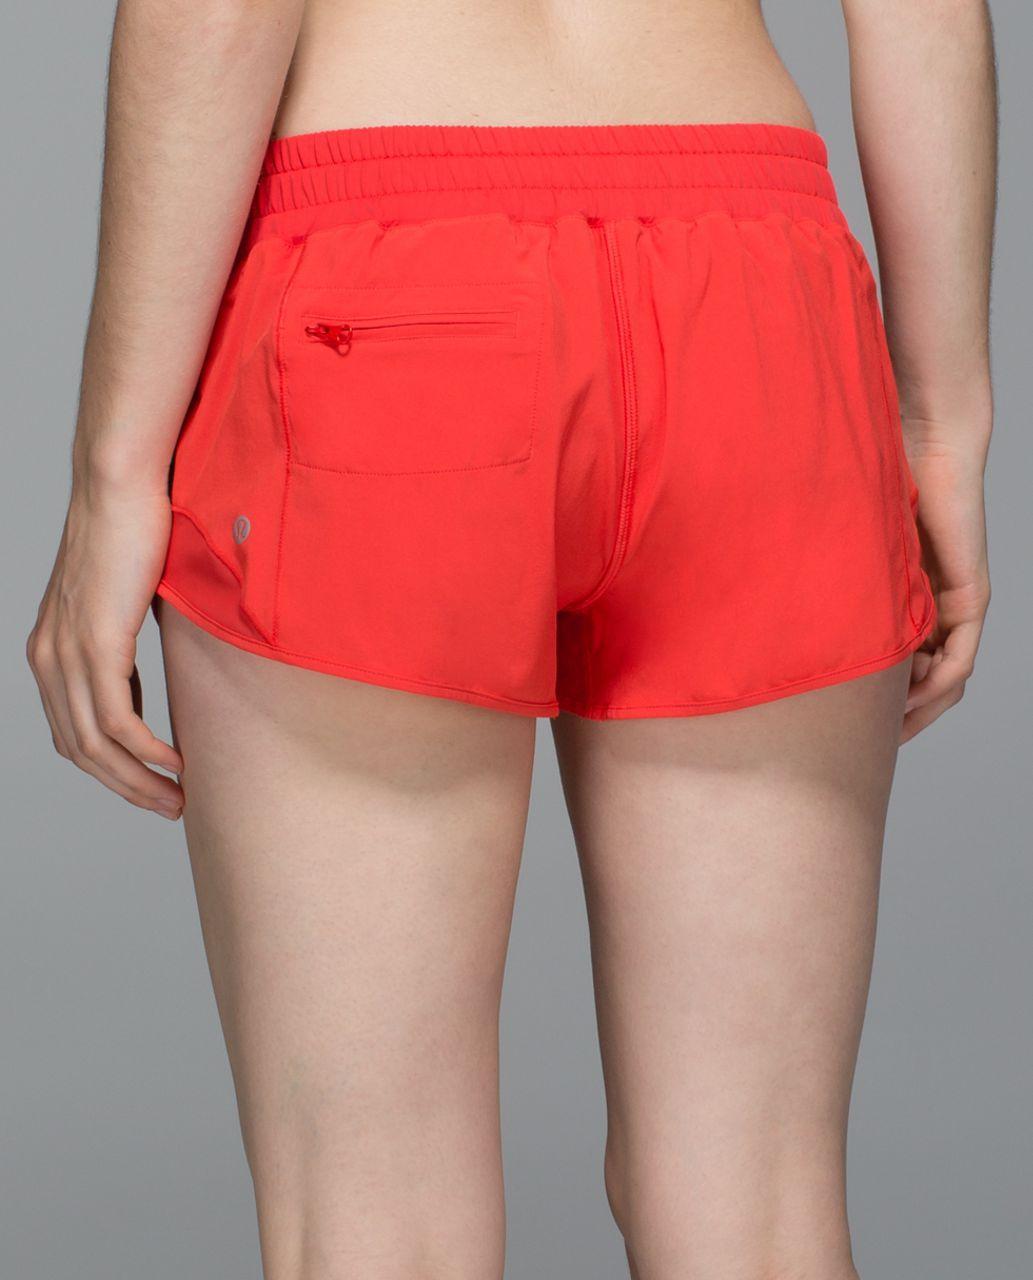 "Lululemon Hotty Hot Short *2.5"" - Alarming"